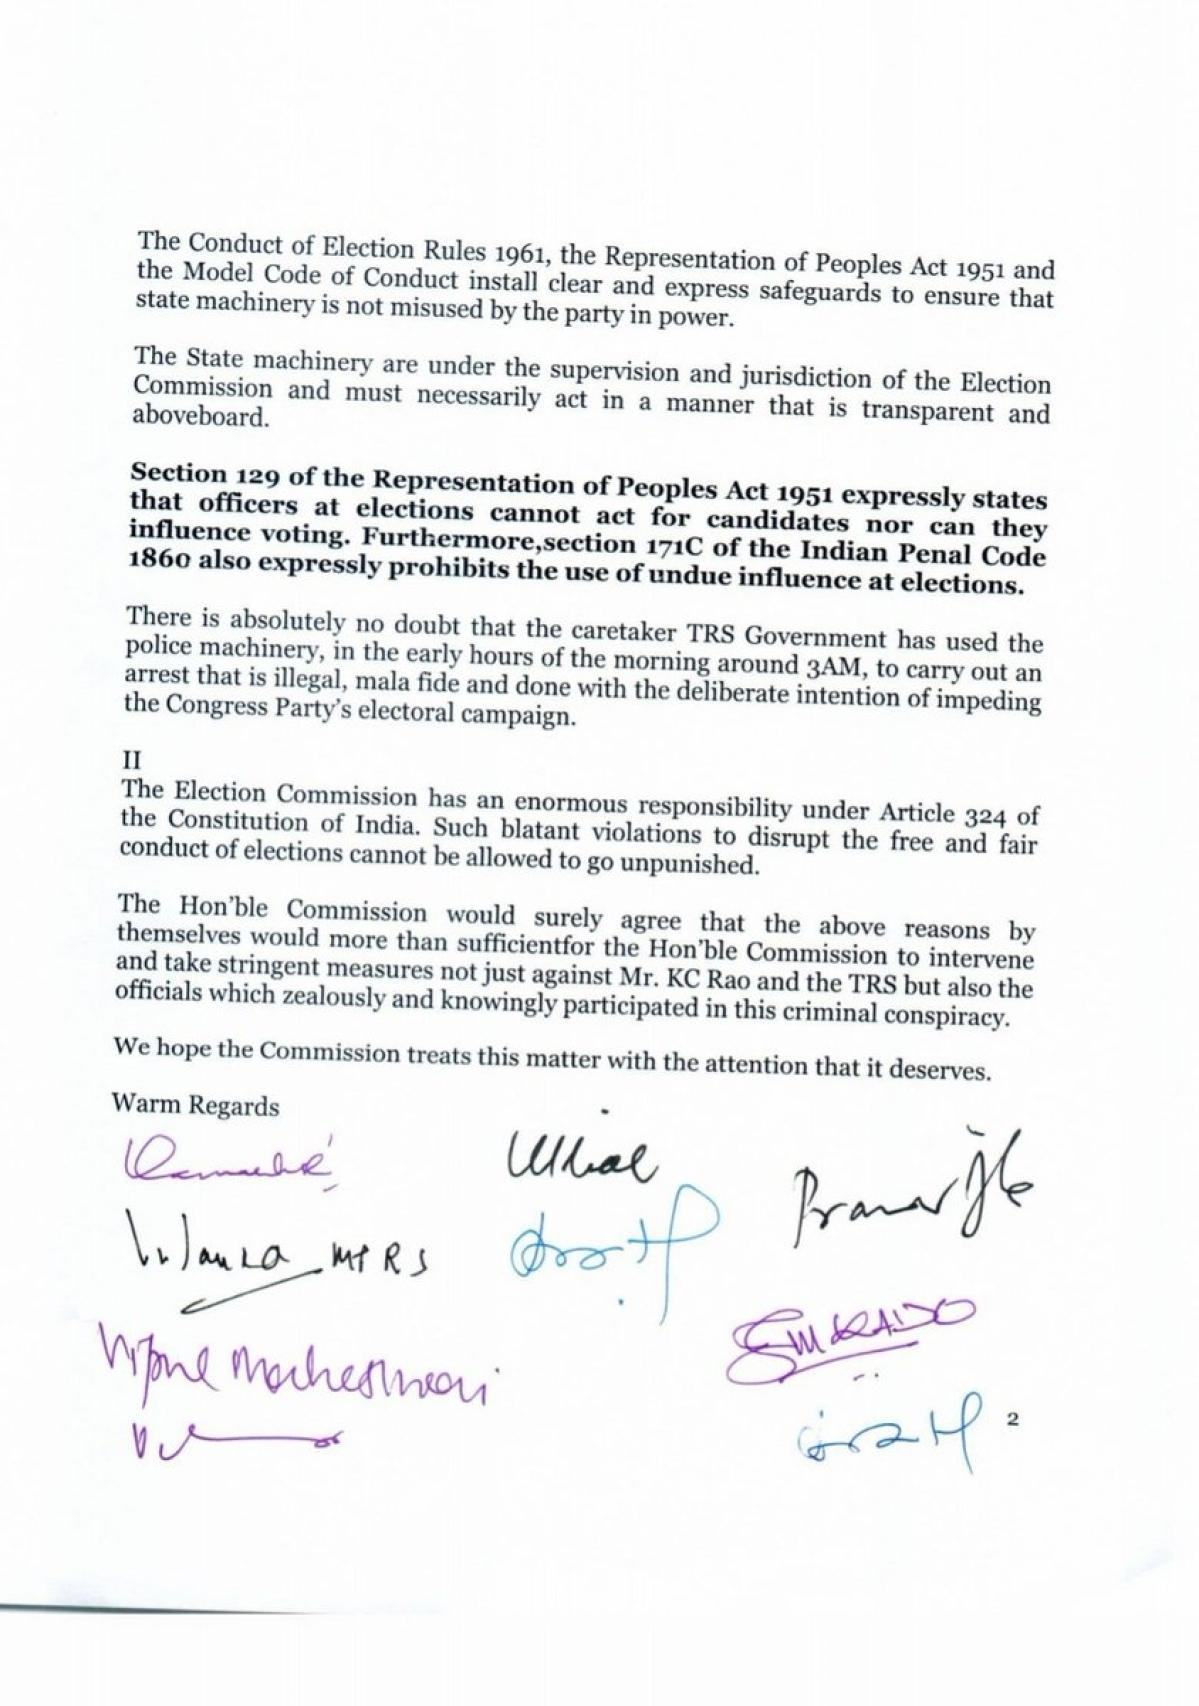 Telangana Elections 2018: Telangana Polls: War of Words